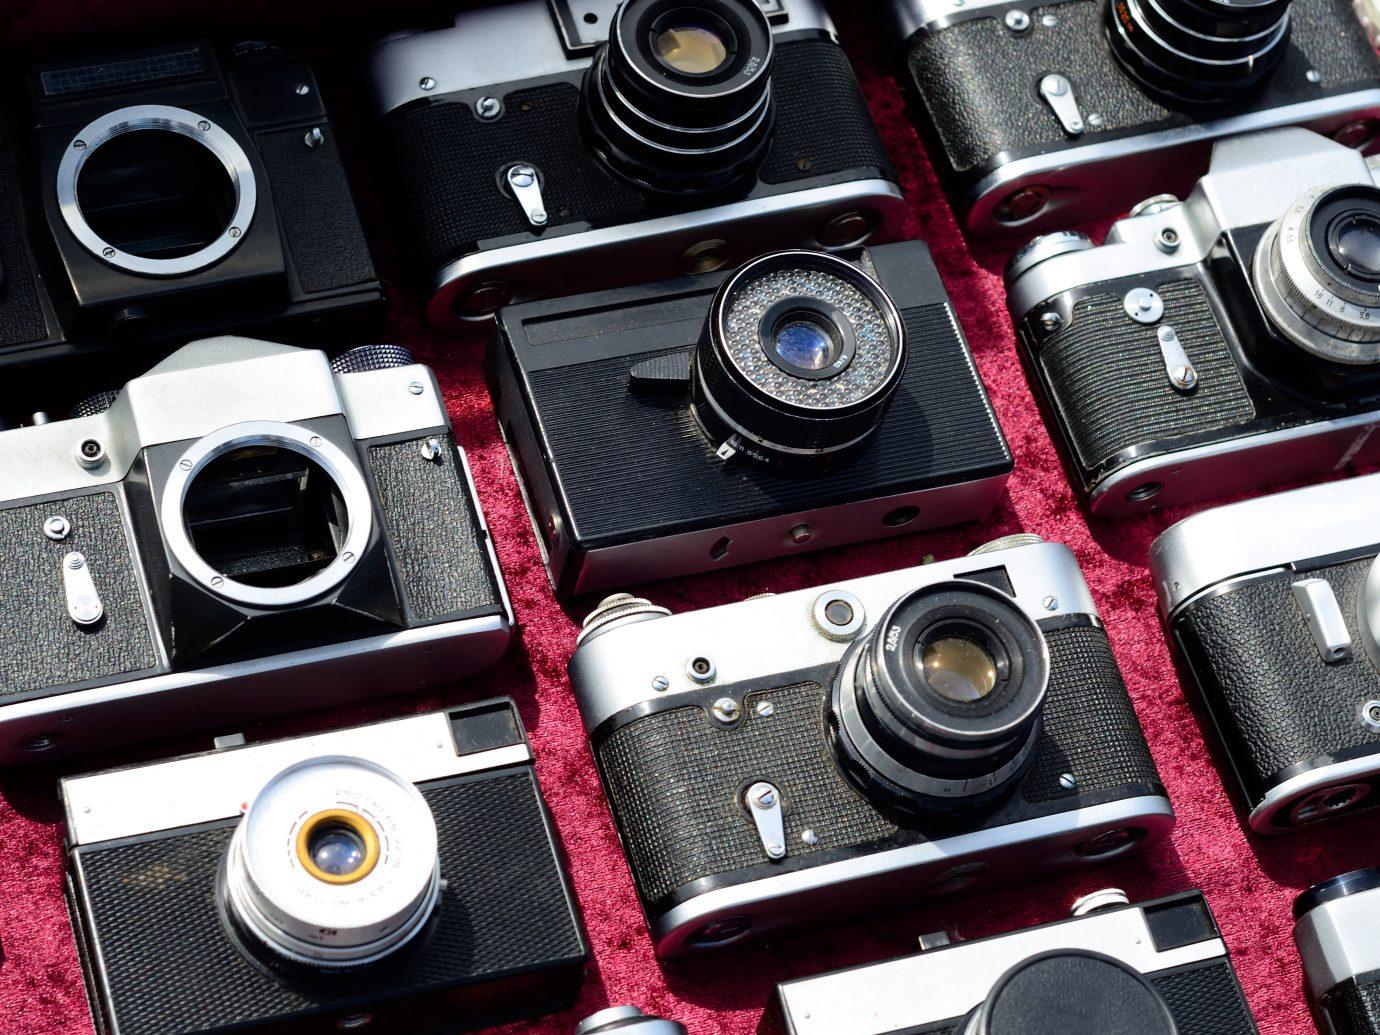 Many old cameras